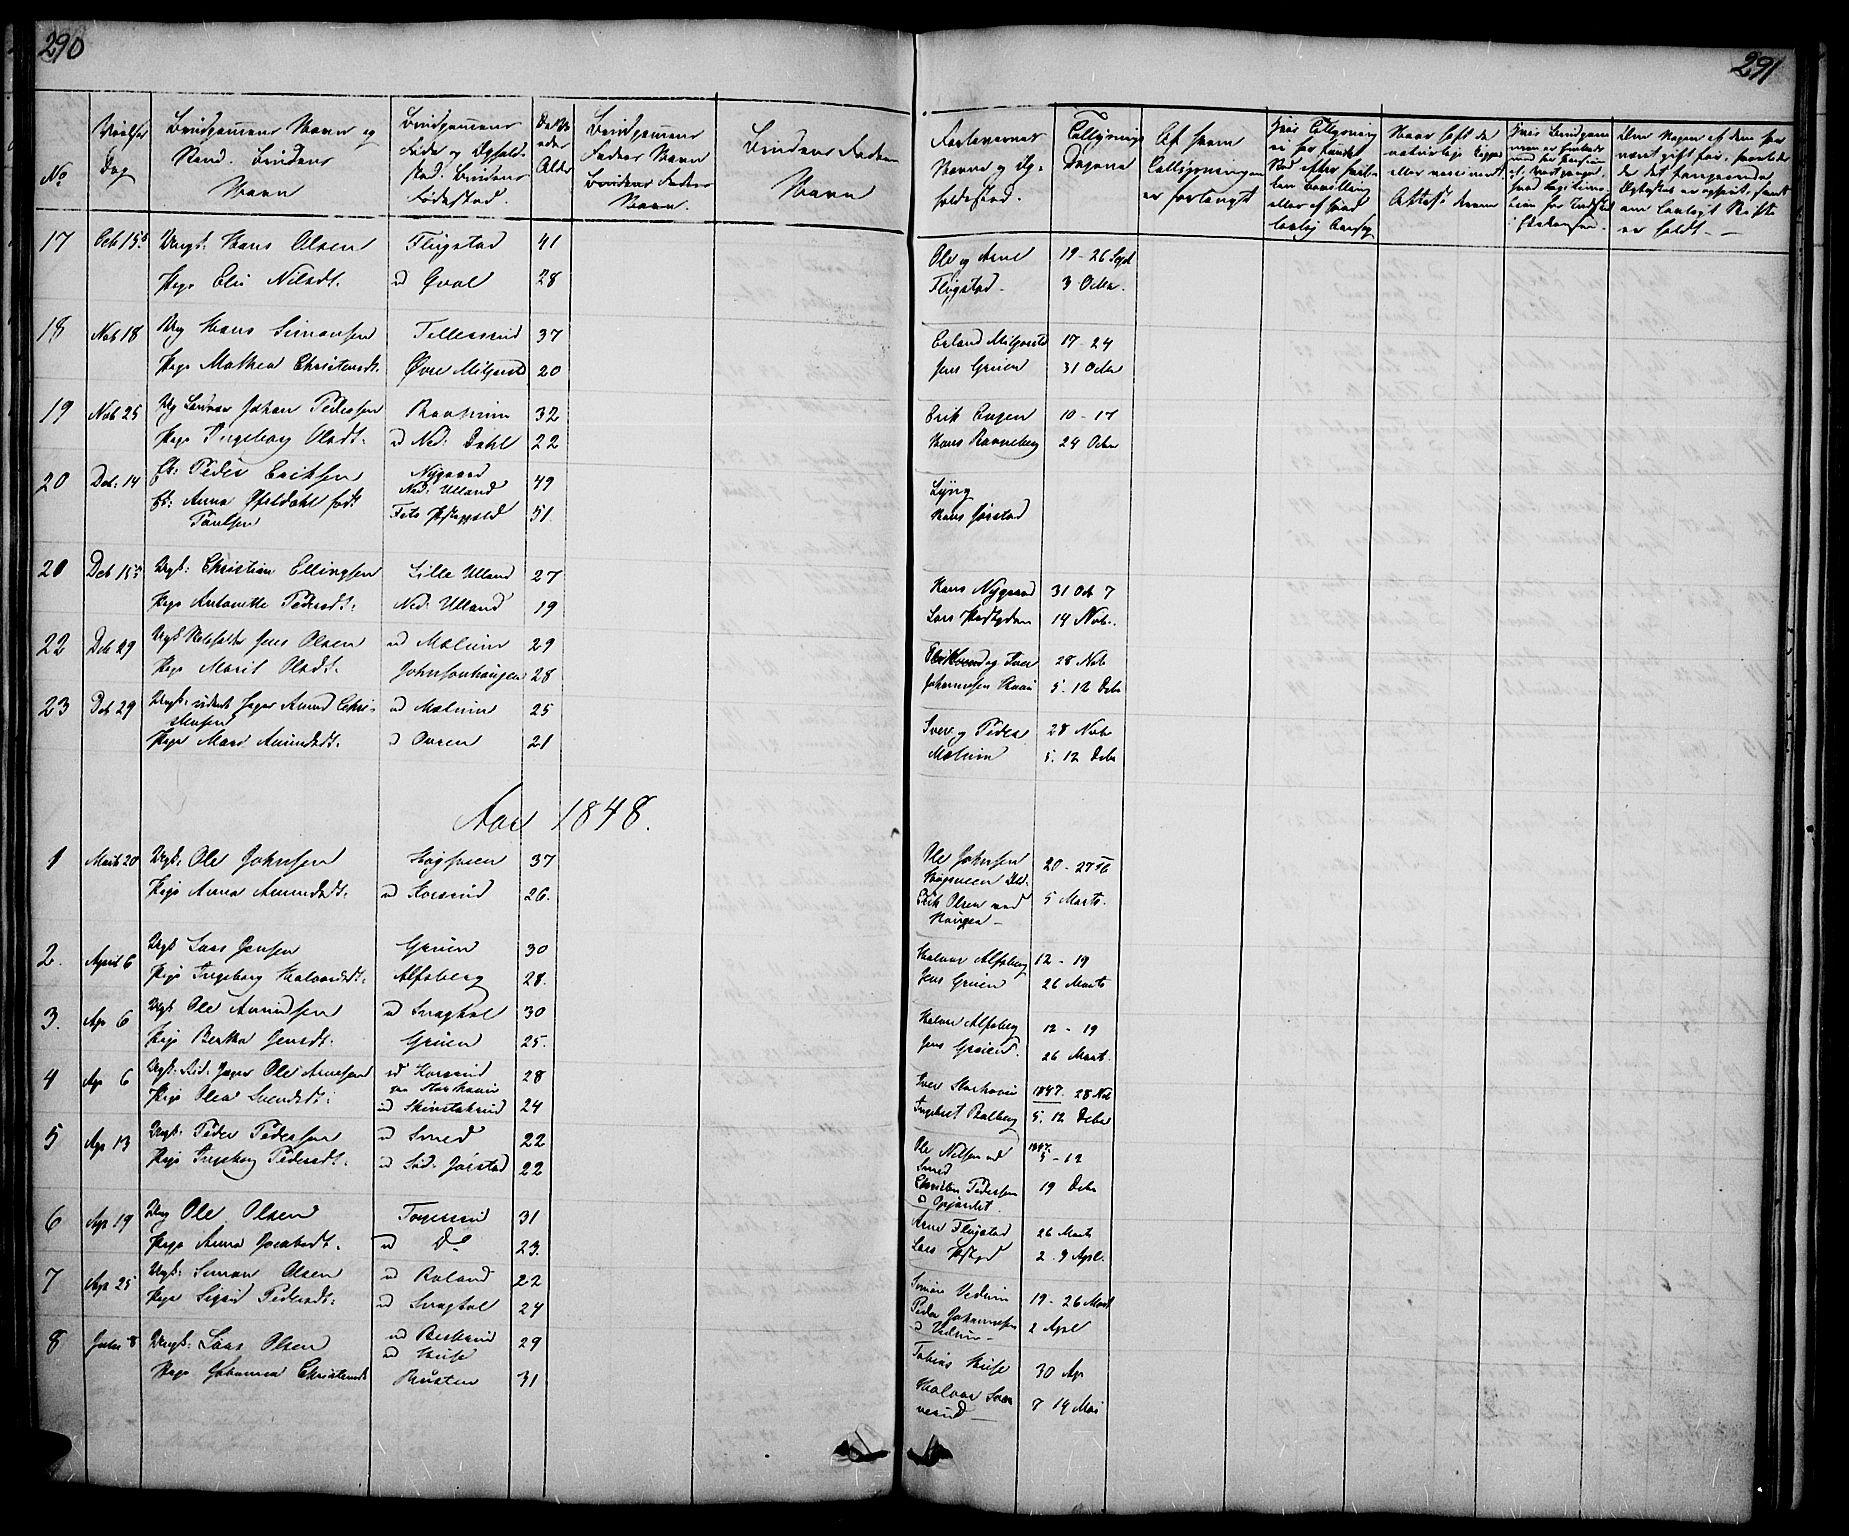 SAH, Fåberg prestekontor, Klokkerbok nr. 5, 1837-1864, s. 290-291